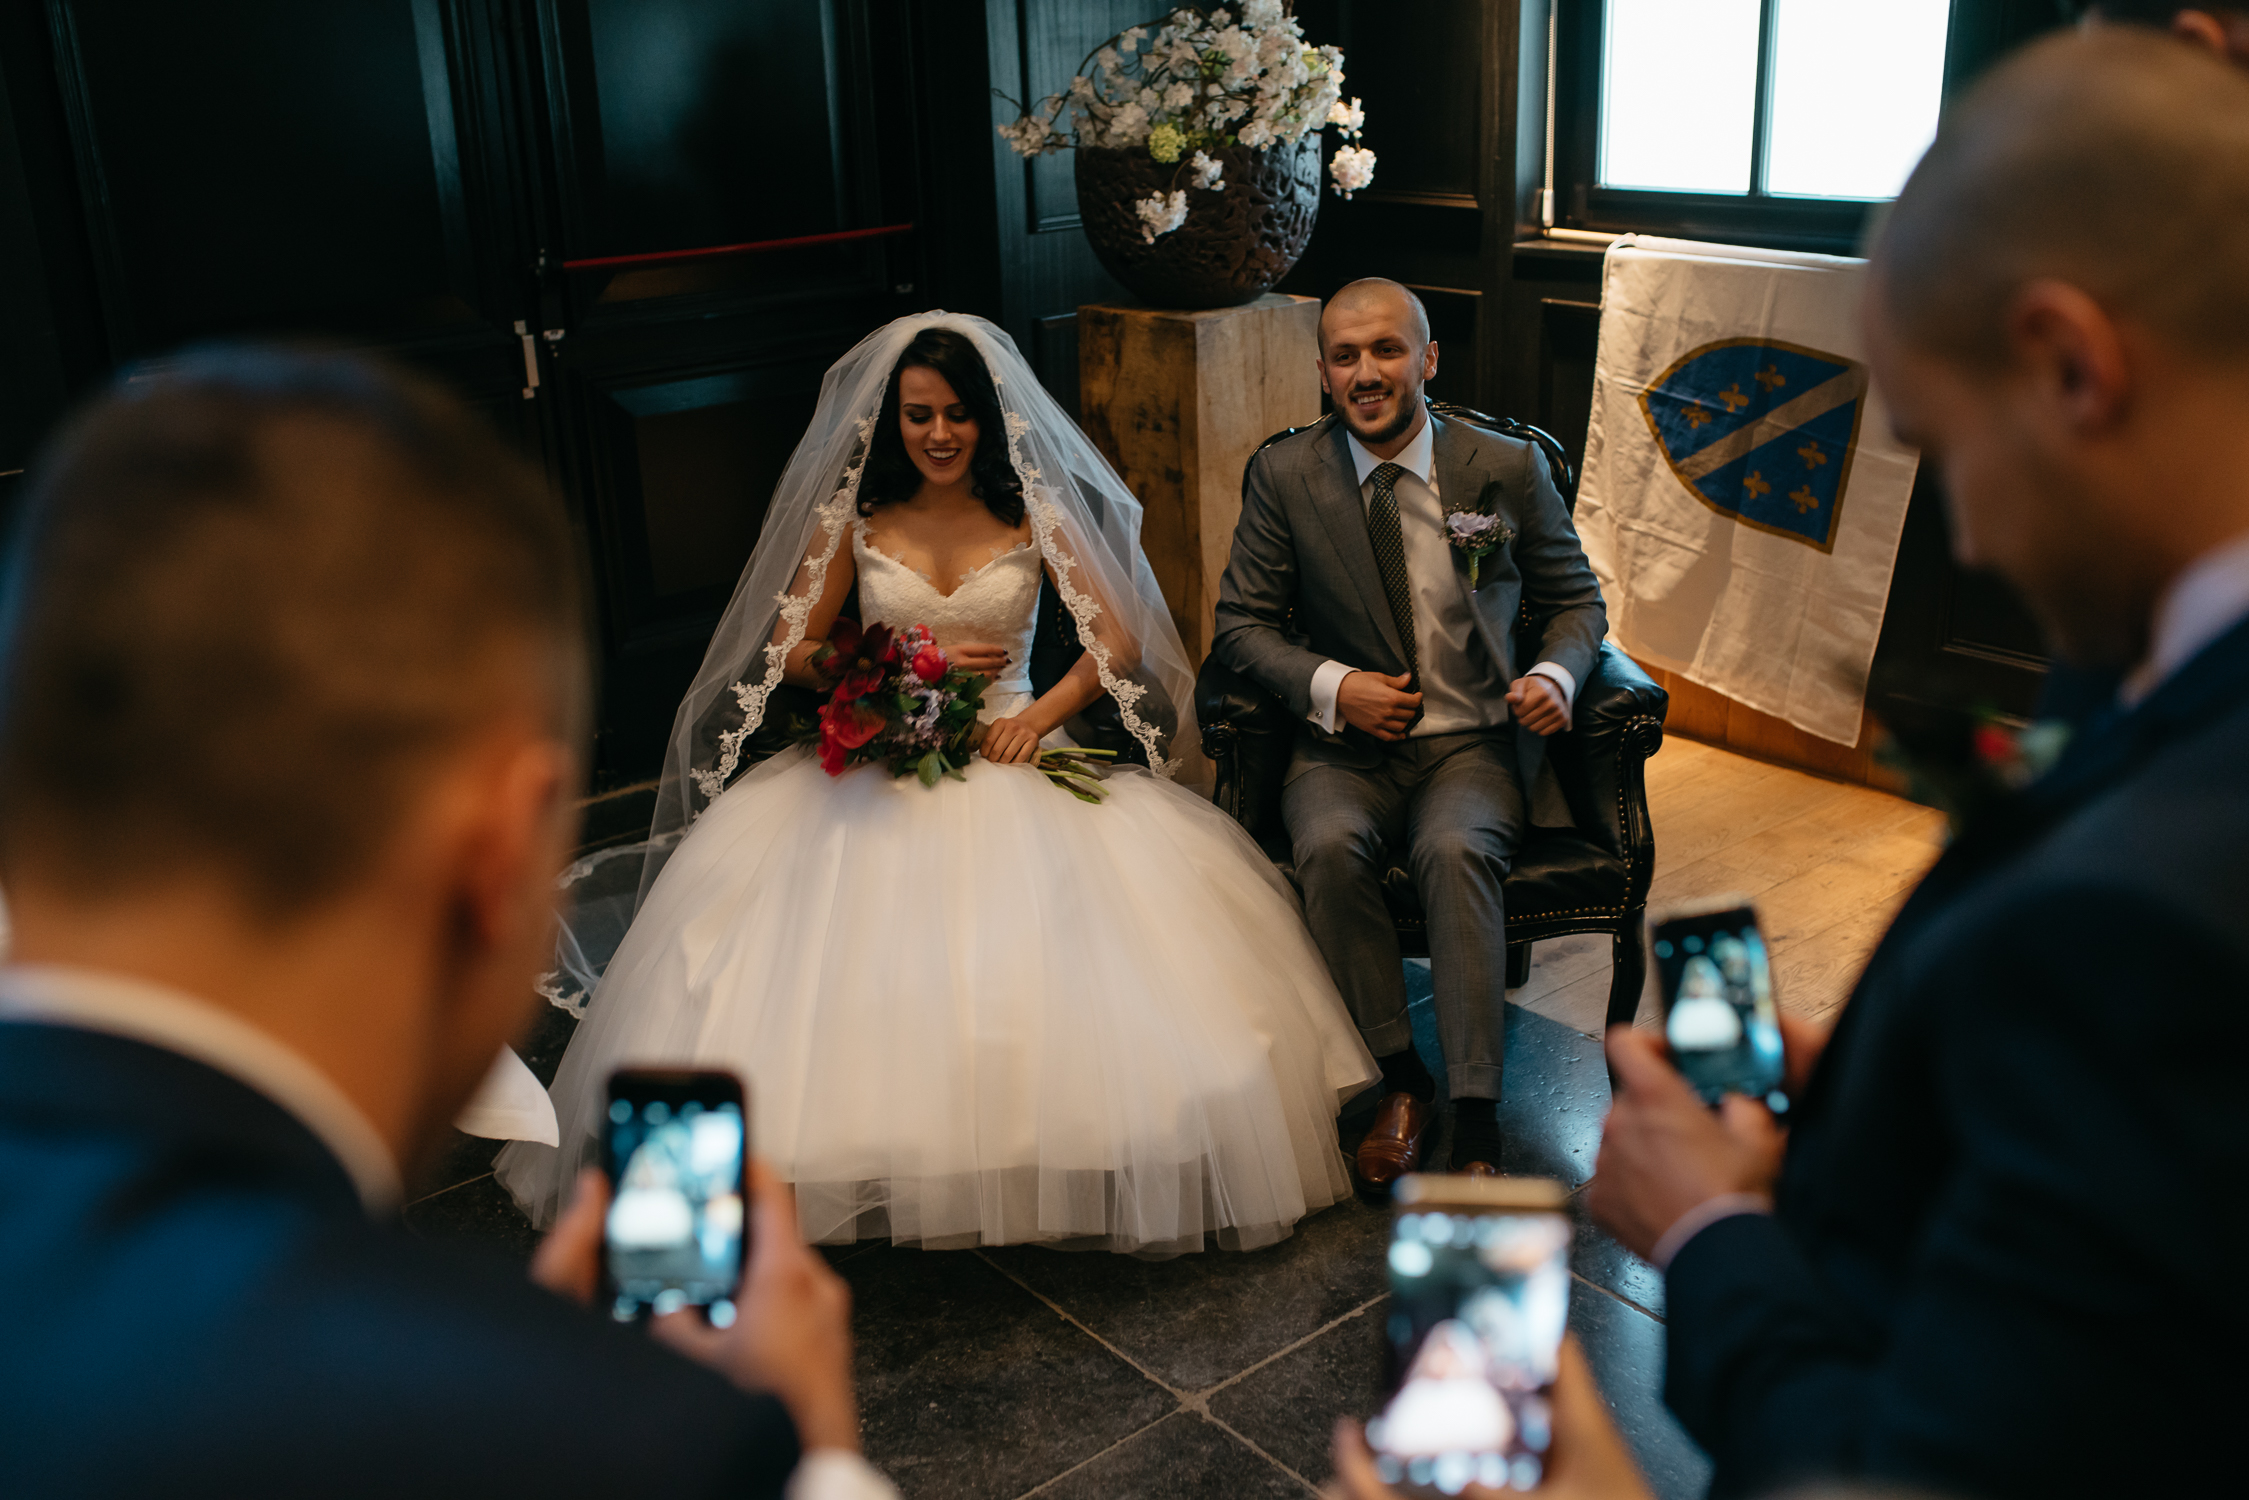 bruidsfotografie-bruidsfotograaf-mark-hadden-amsterdam-rotterdam-utrecht-wedding-photographer-Dado-Delila-106.jpg